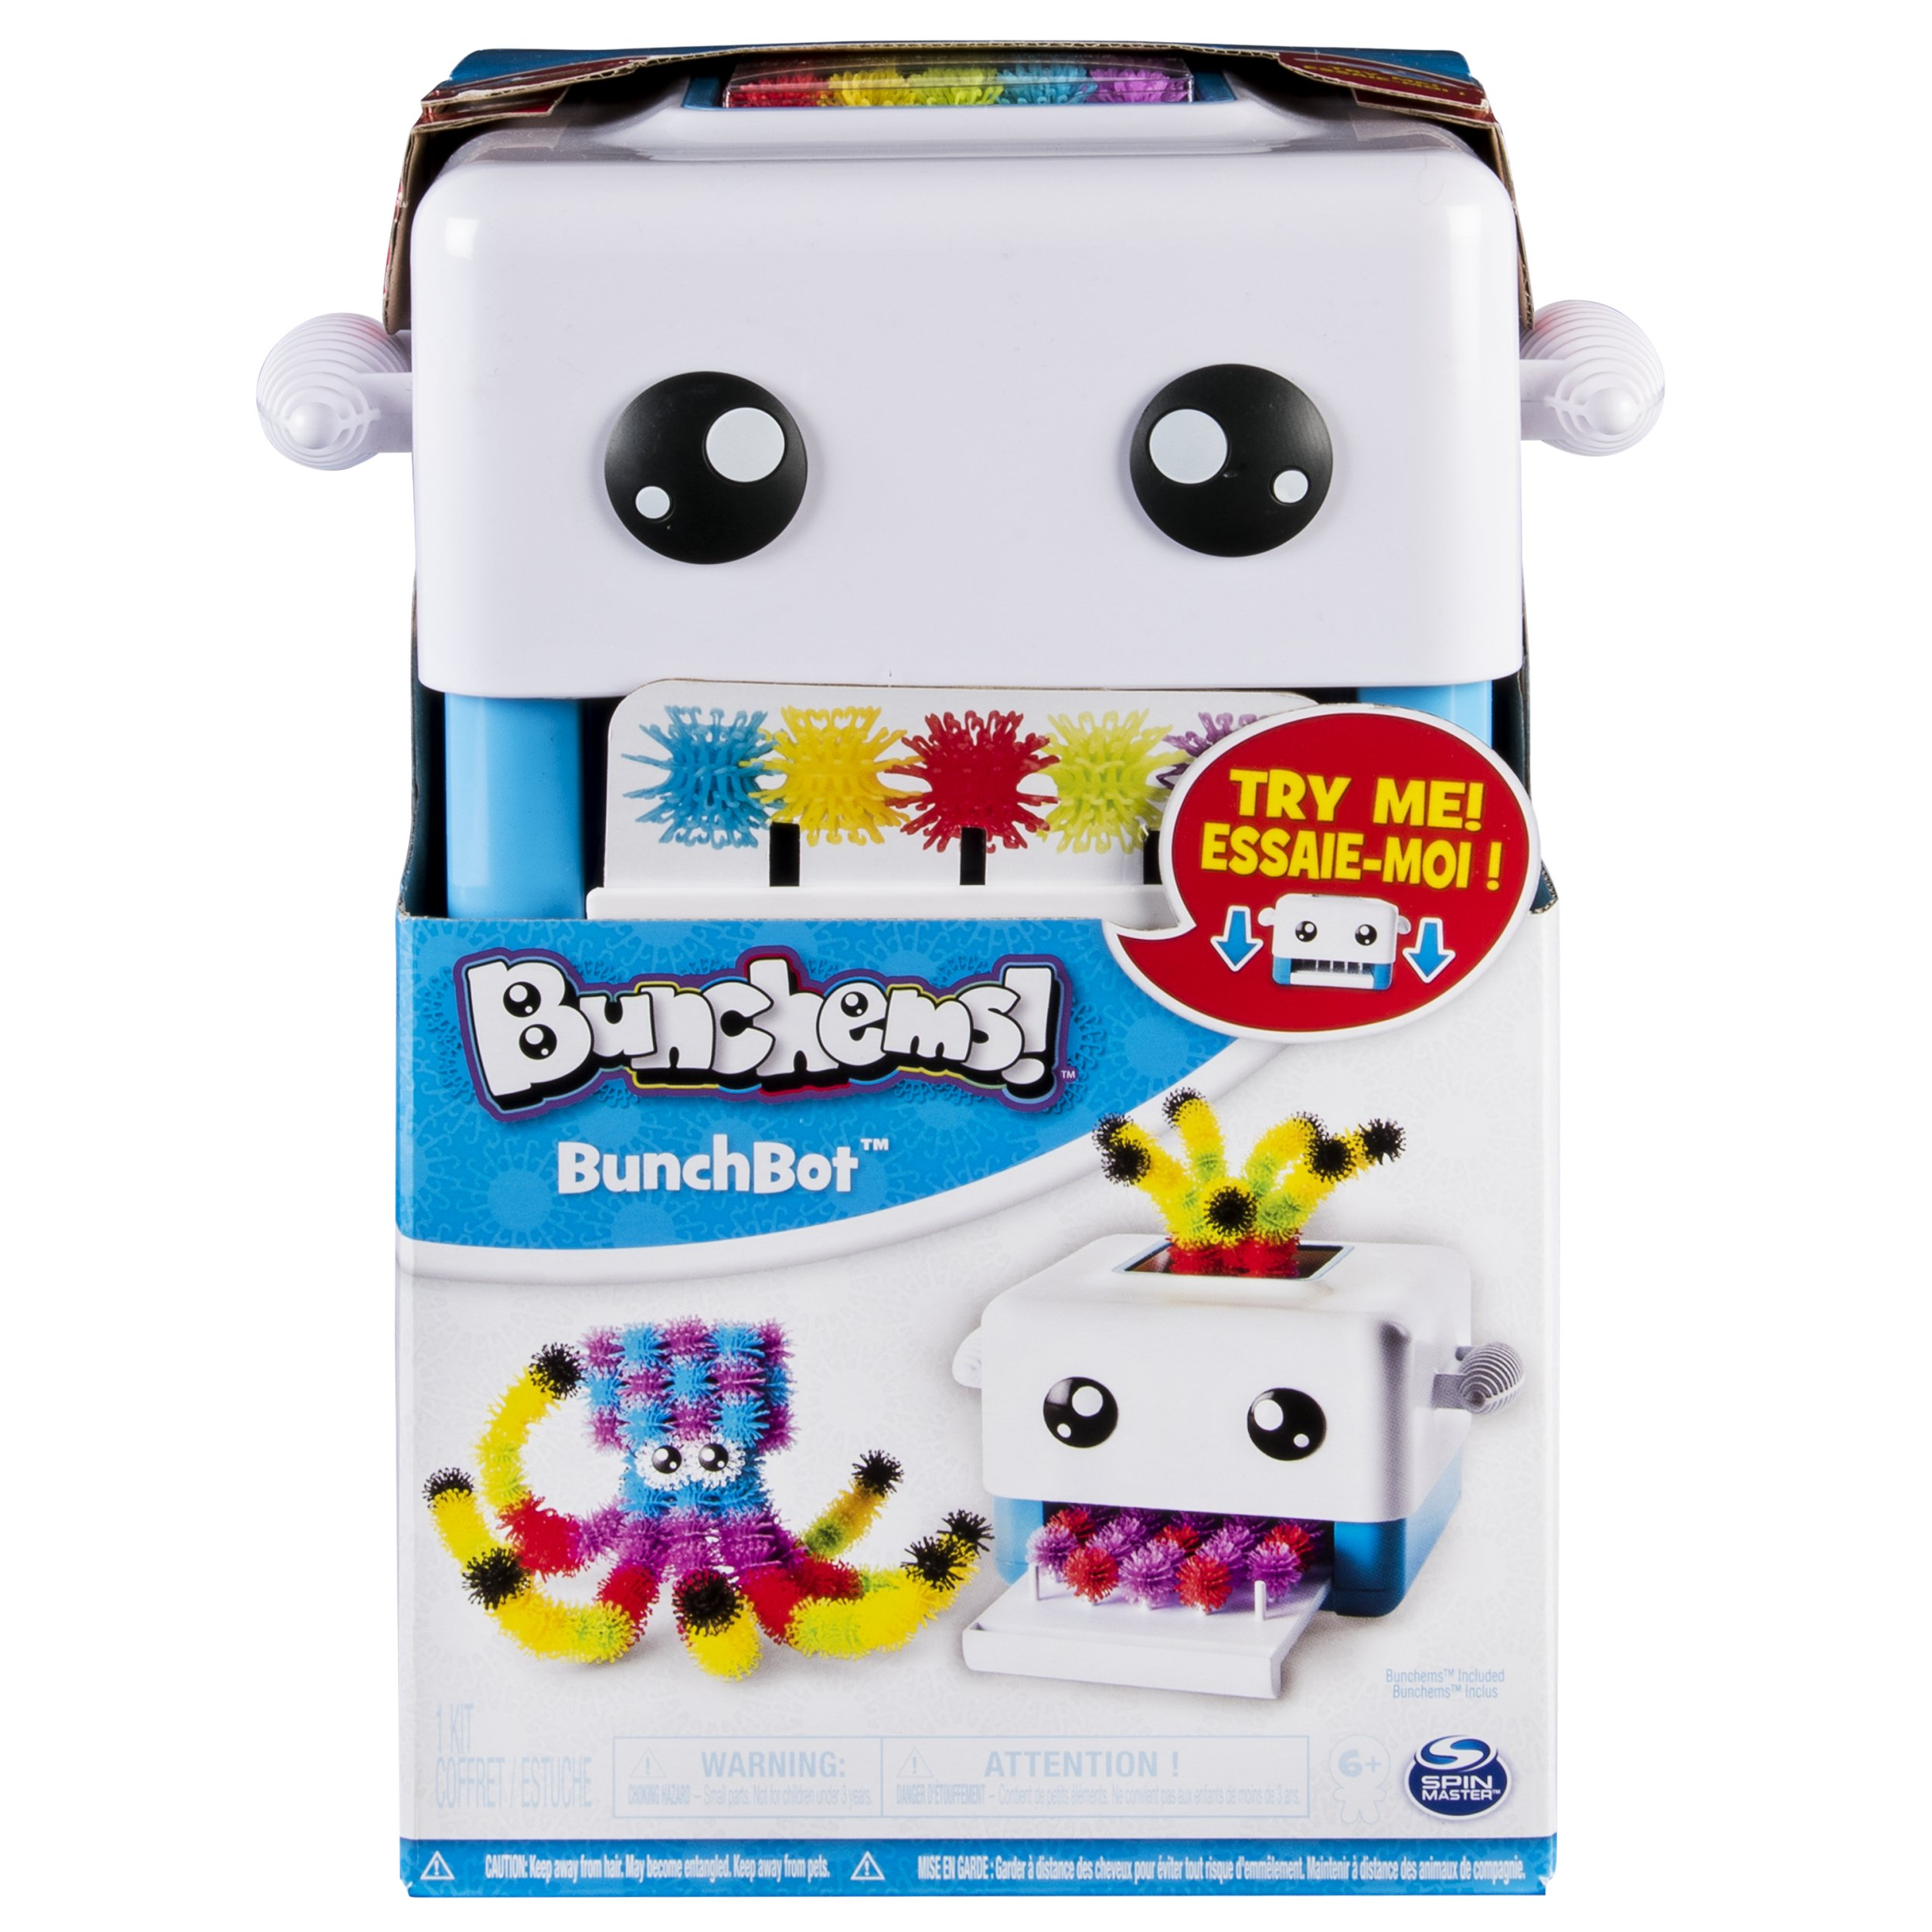 Bunchems BunchBot Bunchems 1080g Compuestos para cerámica y modelaje (Bunchems,, Niños, 300